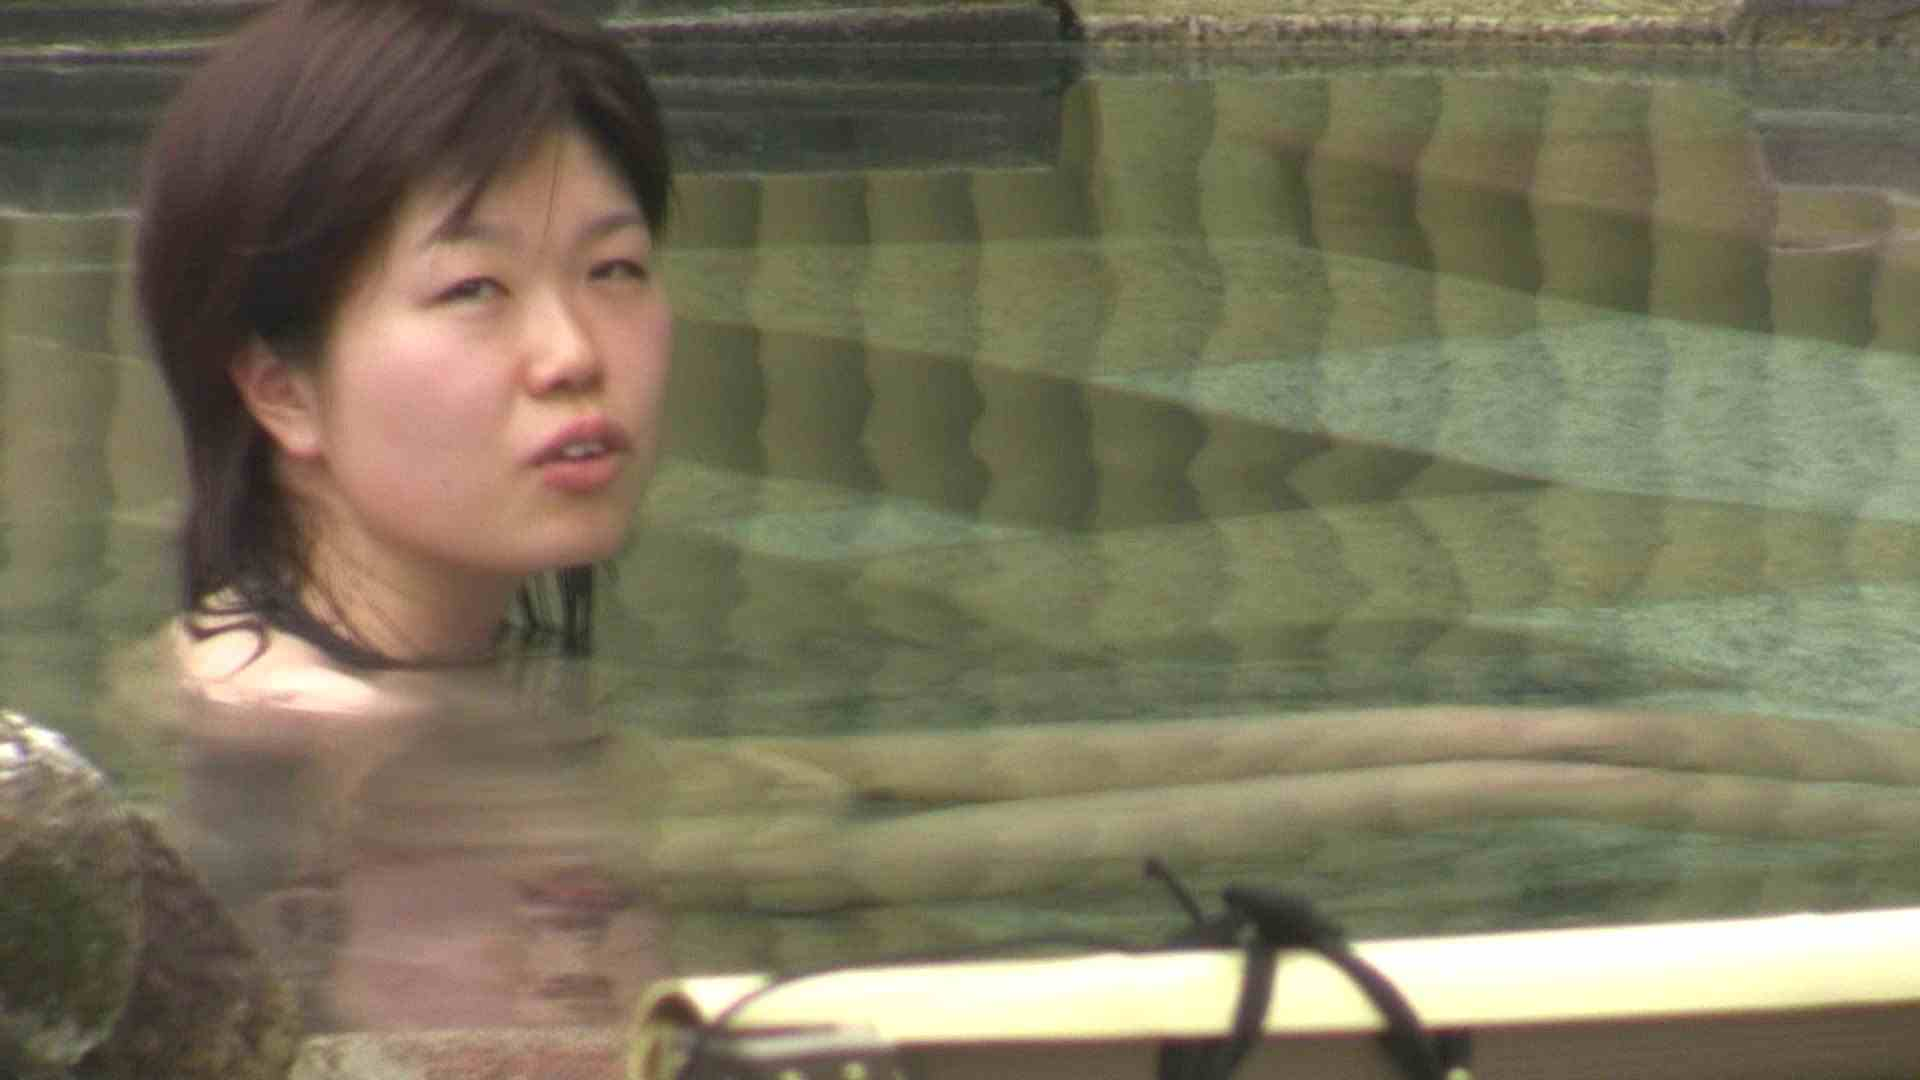 Aquaな露天風呂Vol.675 盗撮 | OLセックス  77画像 37